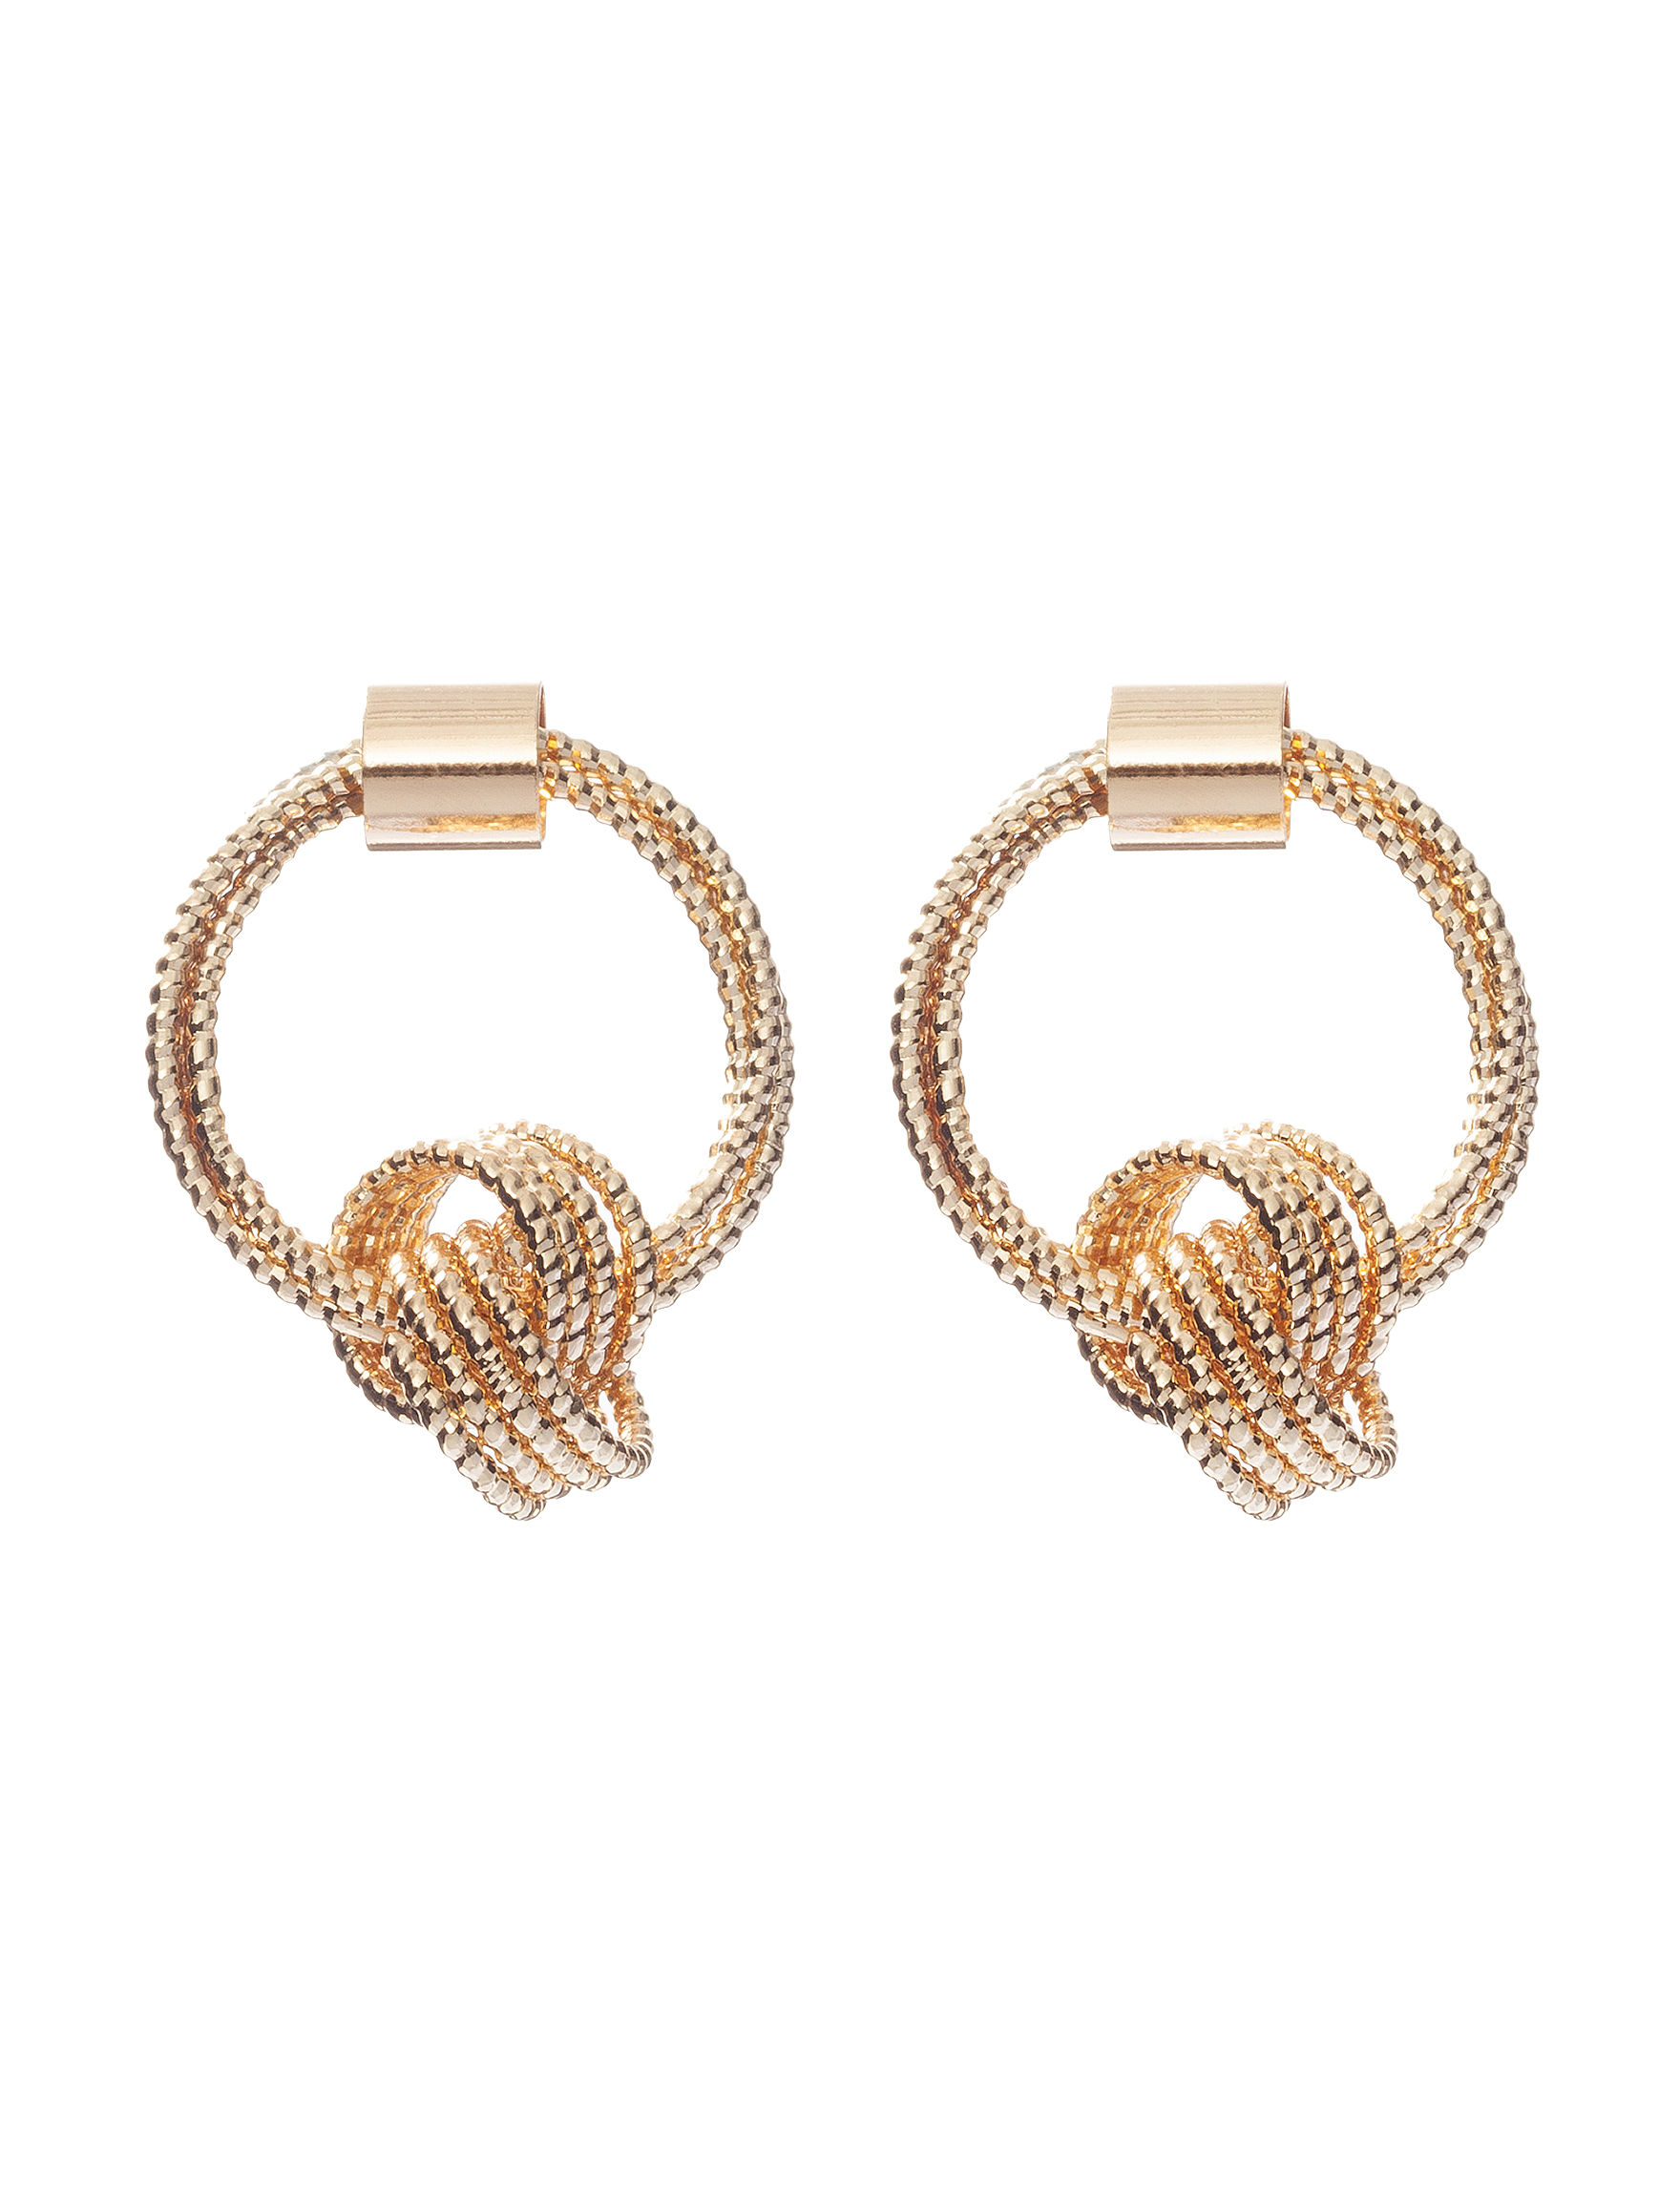 Signature Studio Gold Hoops Earrings Fashion Jewelry